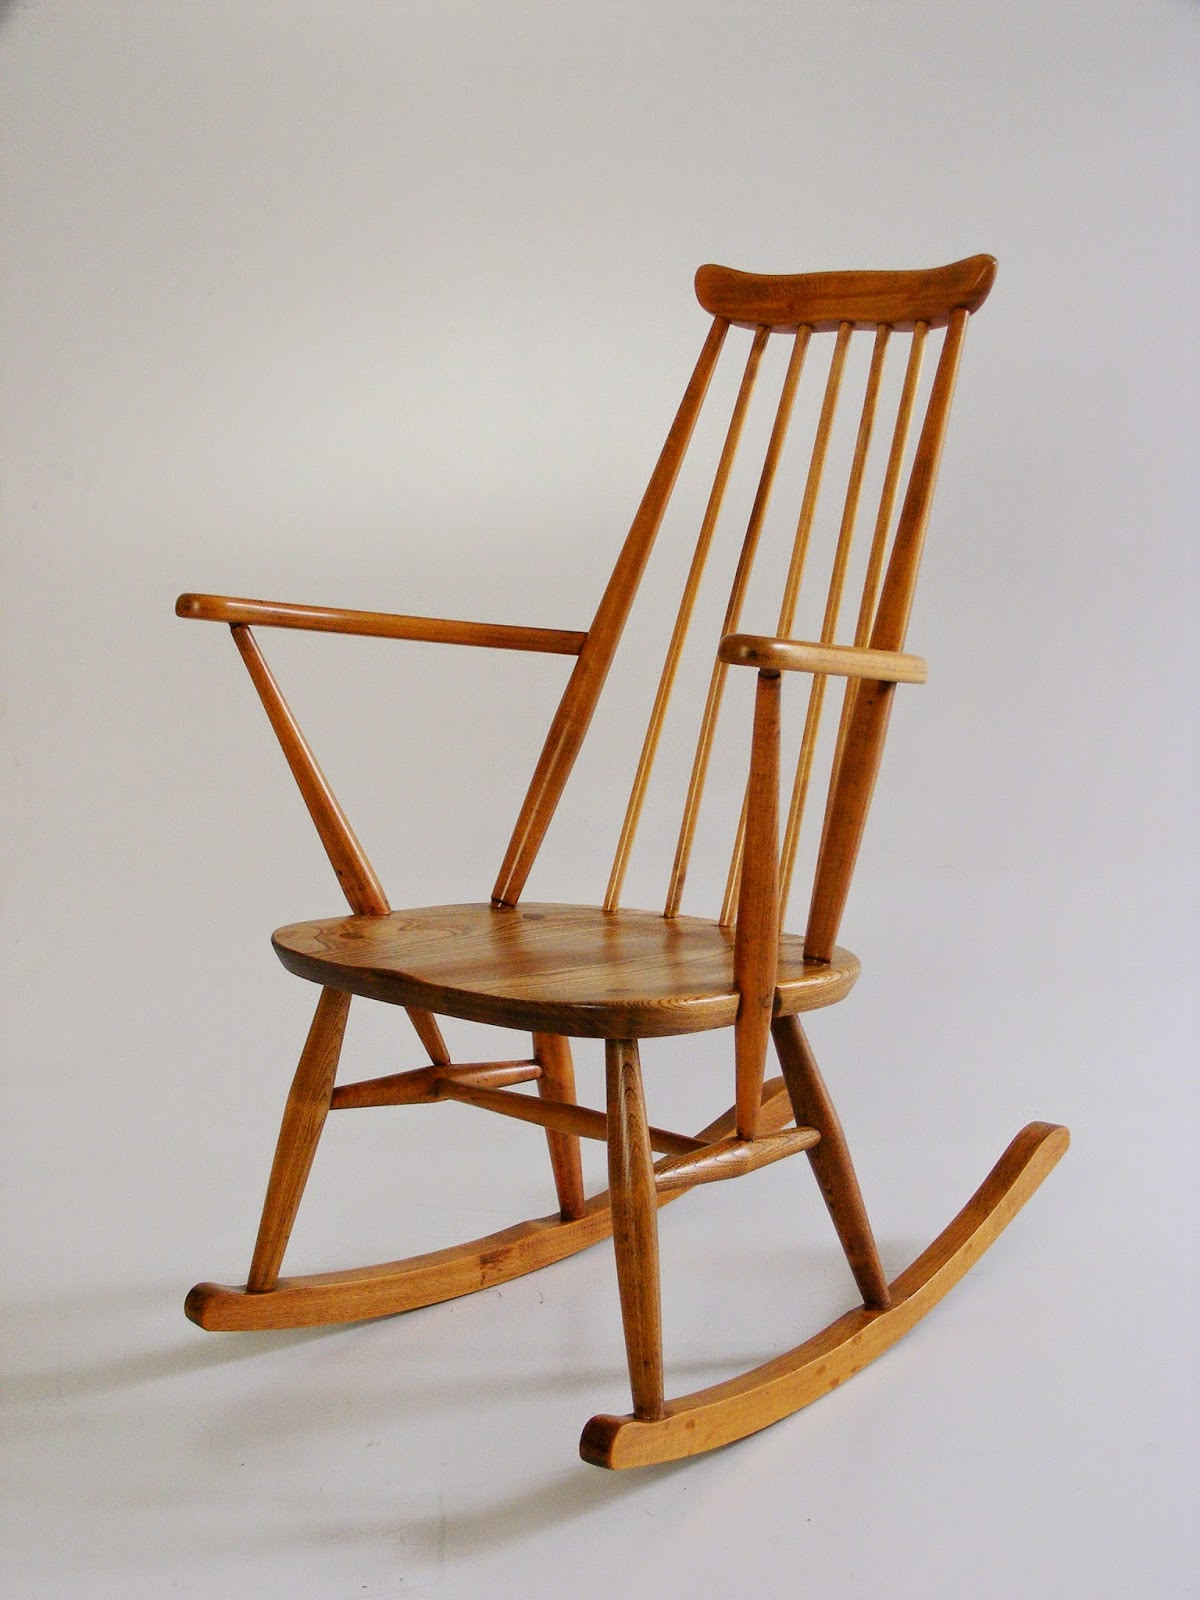 VAMP FURNITURE: New vintage furniture stock just unpacked ...